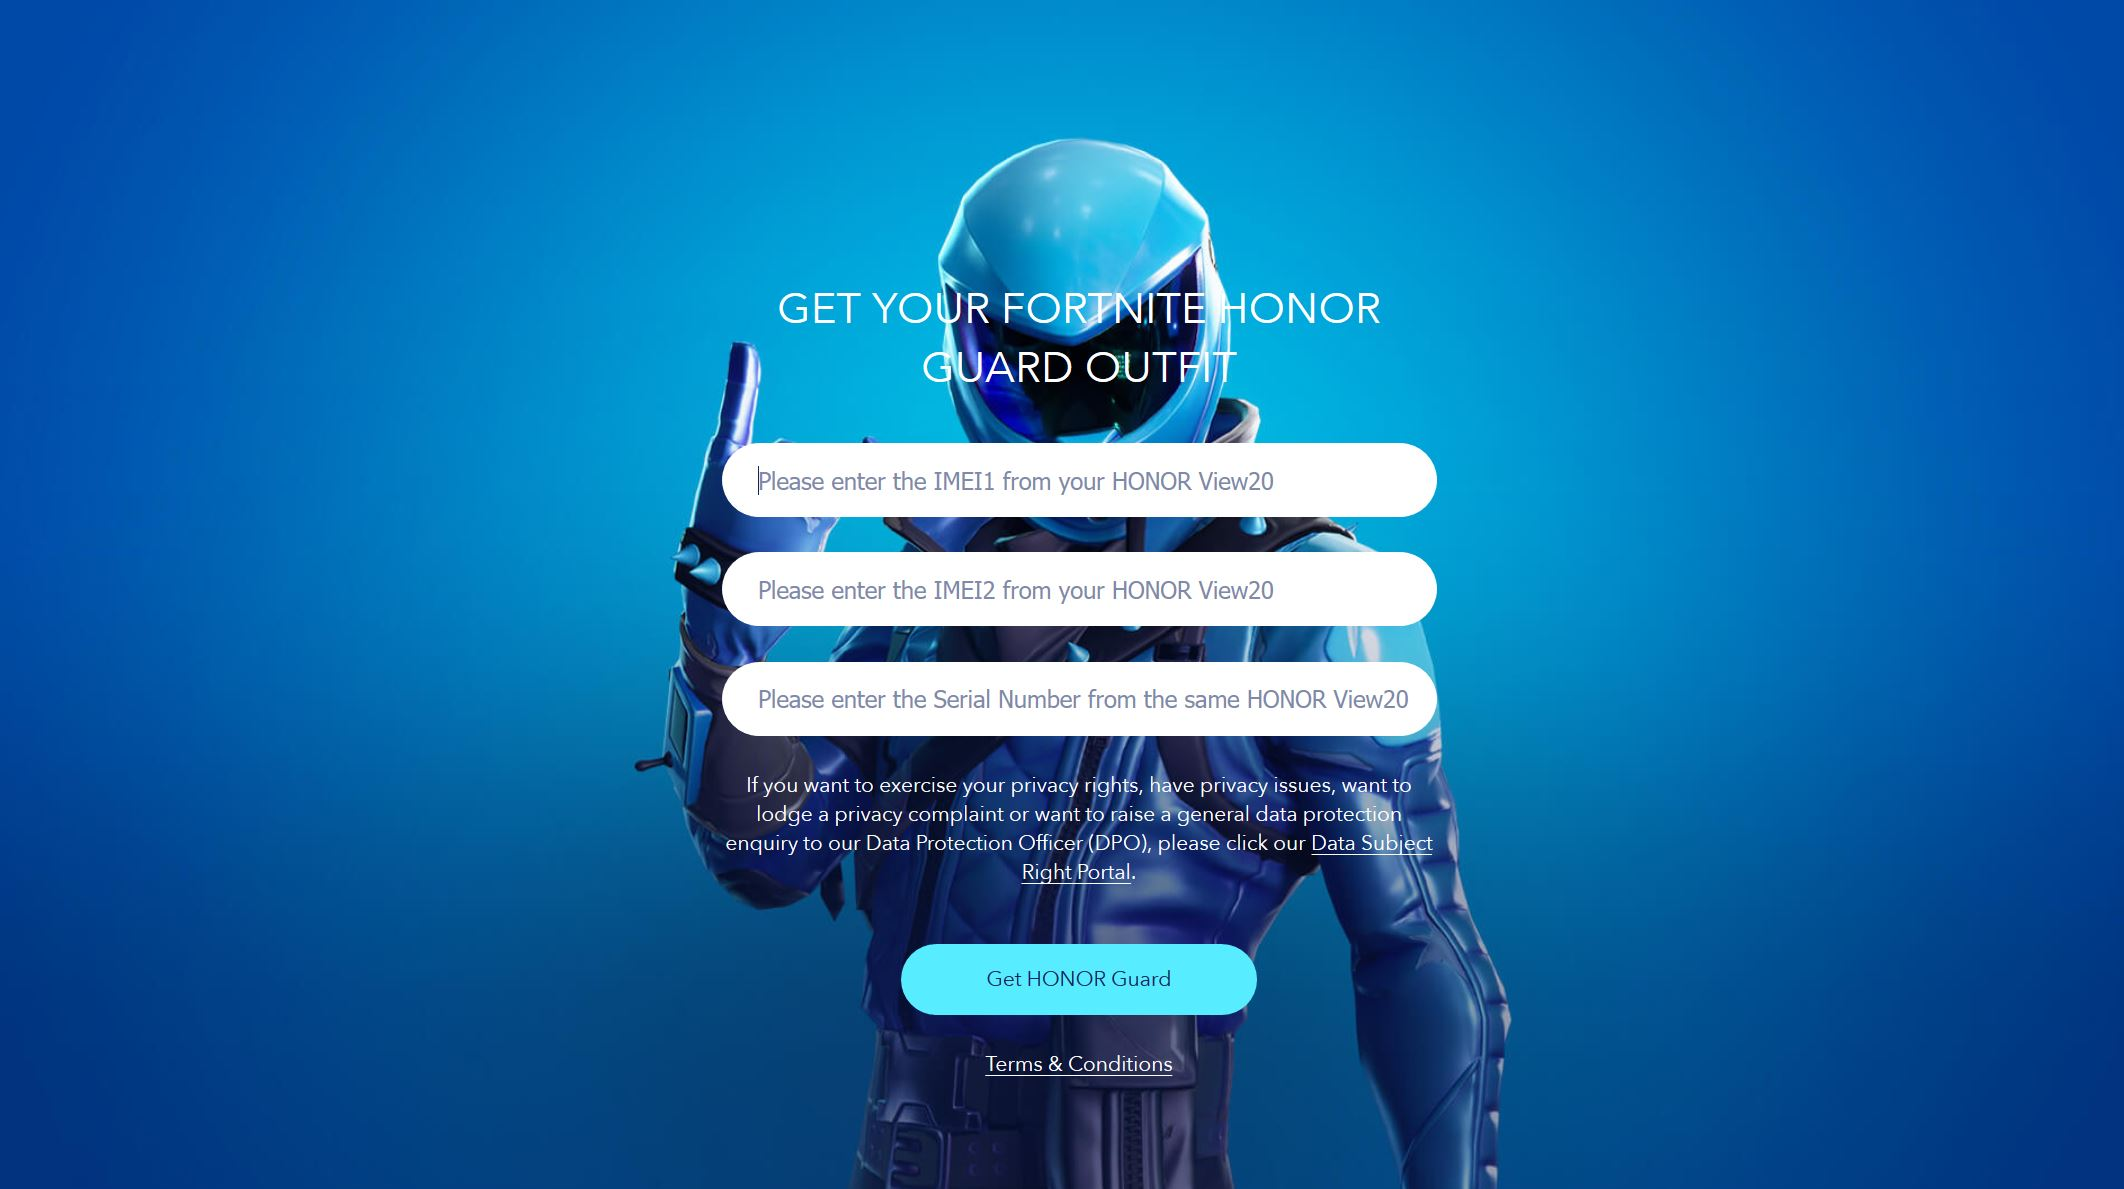 fortnite honor guard skin wie bekomme ich ihn wirklich update - fortnite honor skin phone